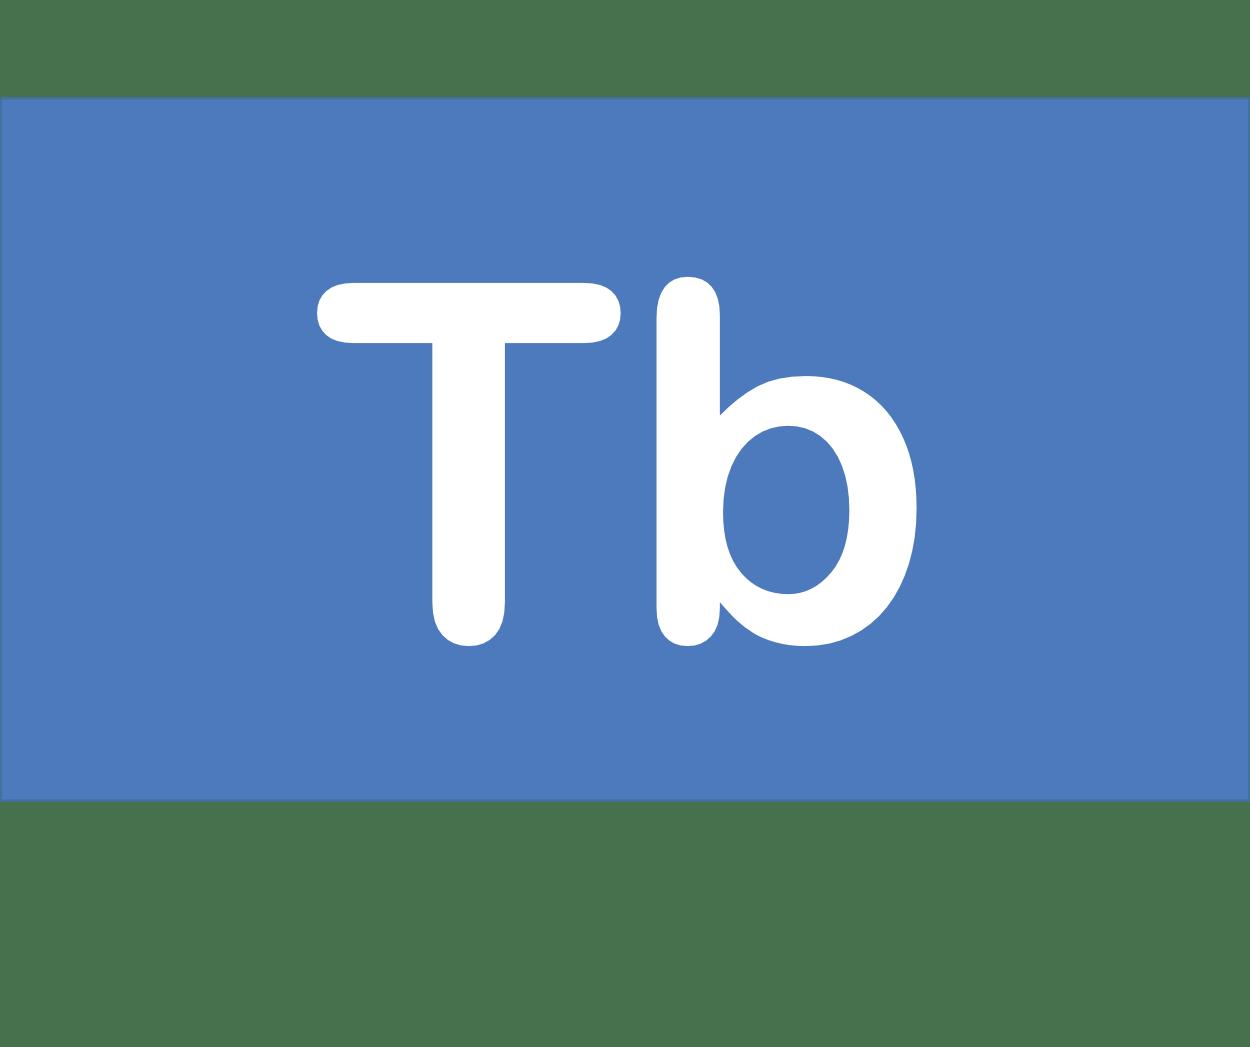 65 Tb テルビウム Terbium 元素 記号 周期表 化学 原子